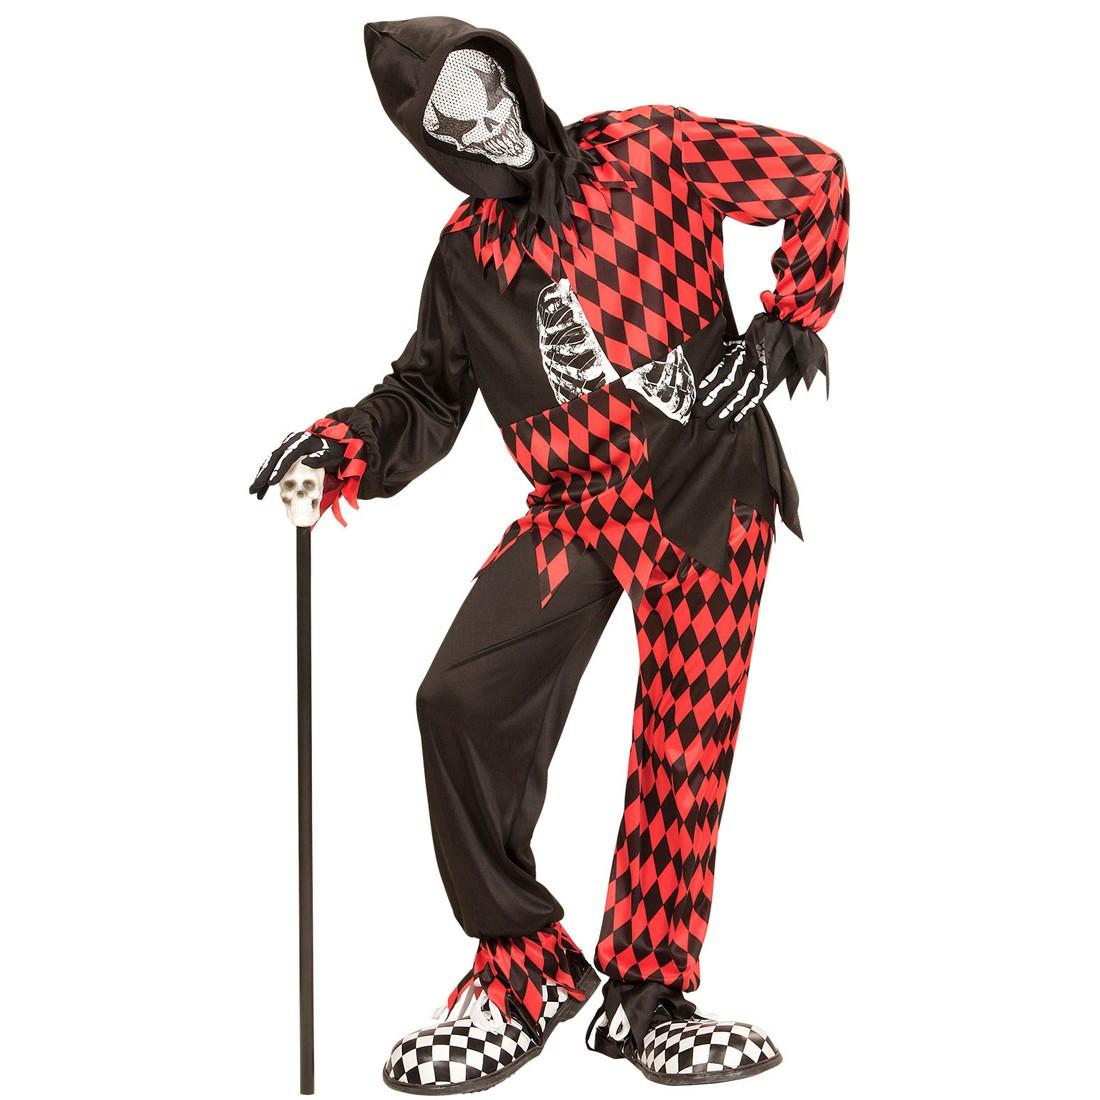 b ser clown kinderkost m harlekin kost m halloween 22 99. Black Bedroom Furniture Sets. Home Design Ideas